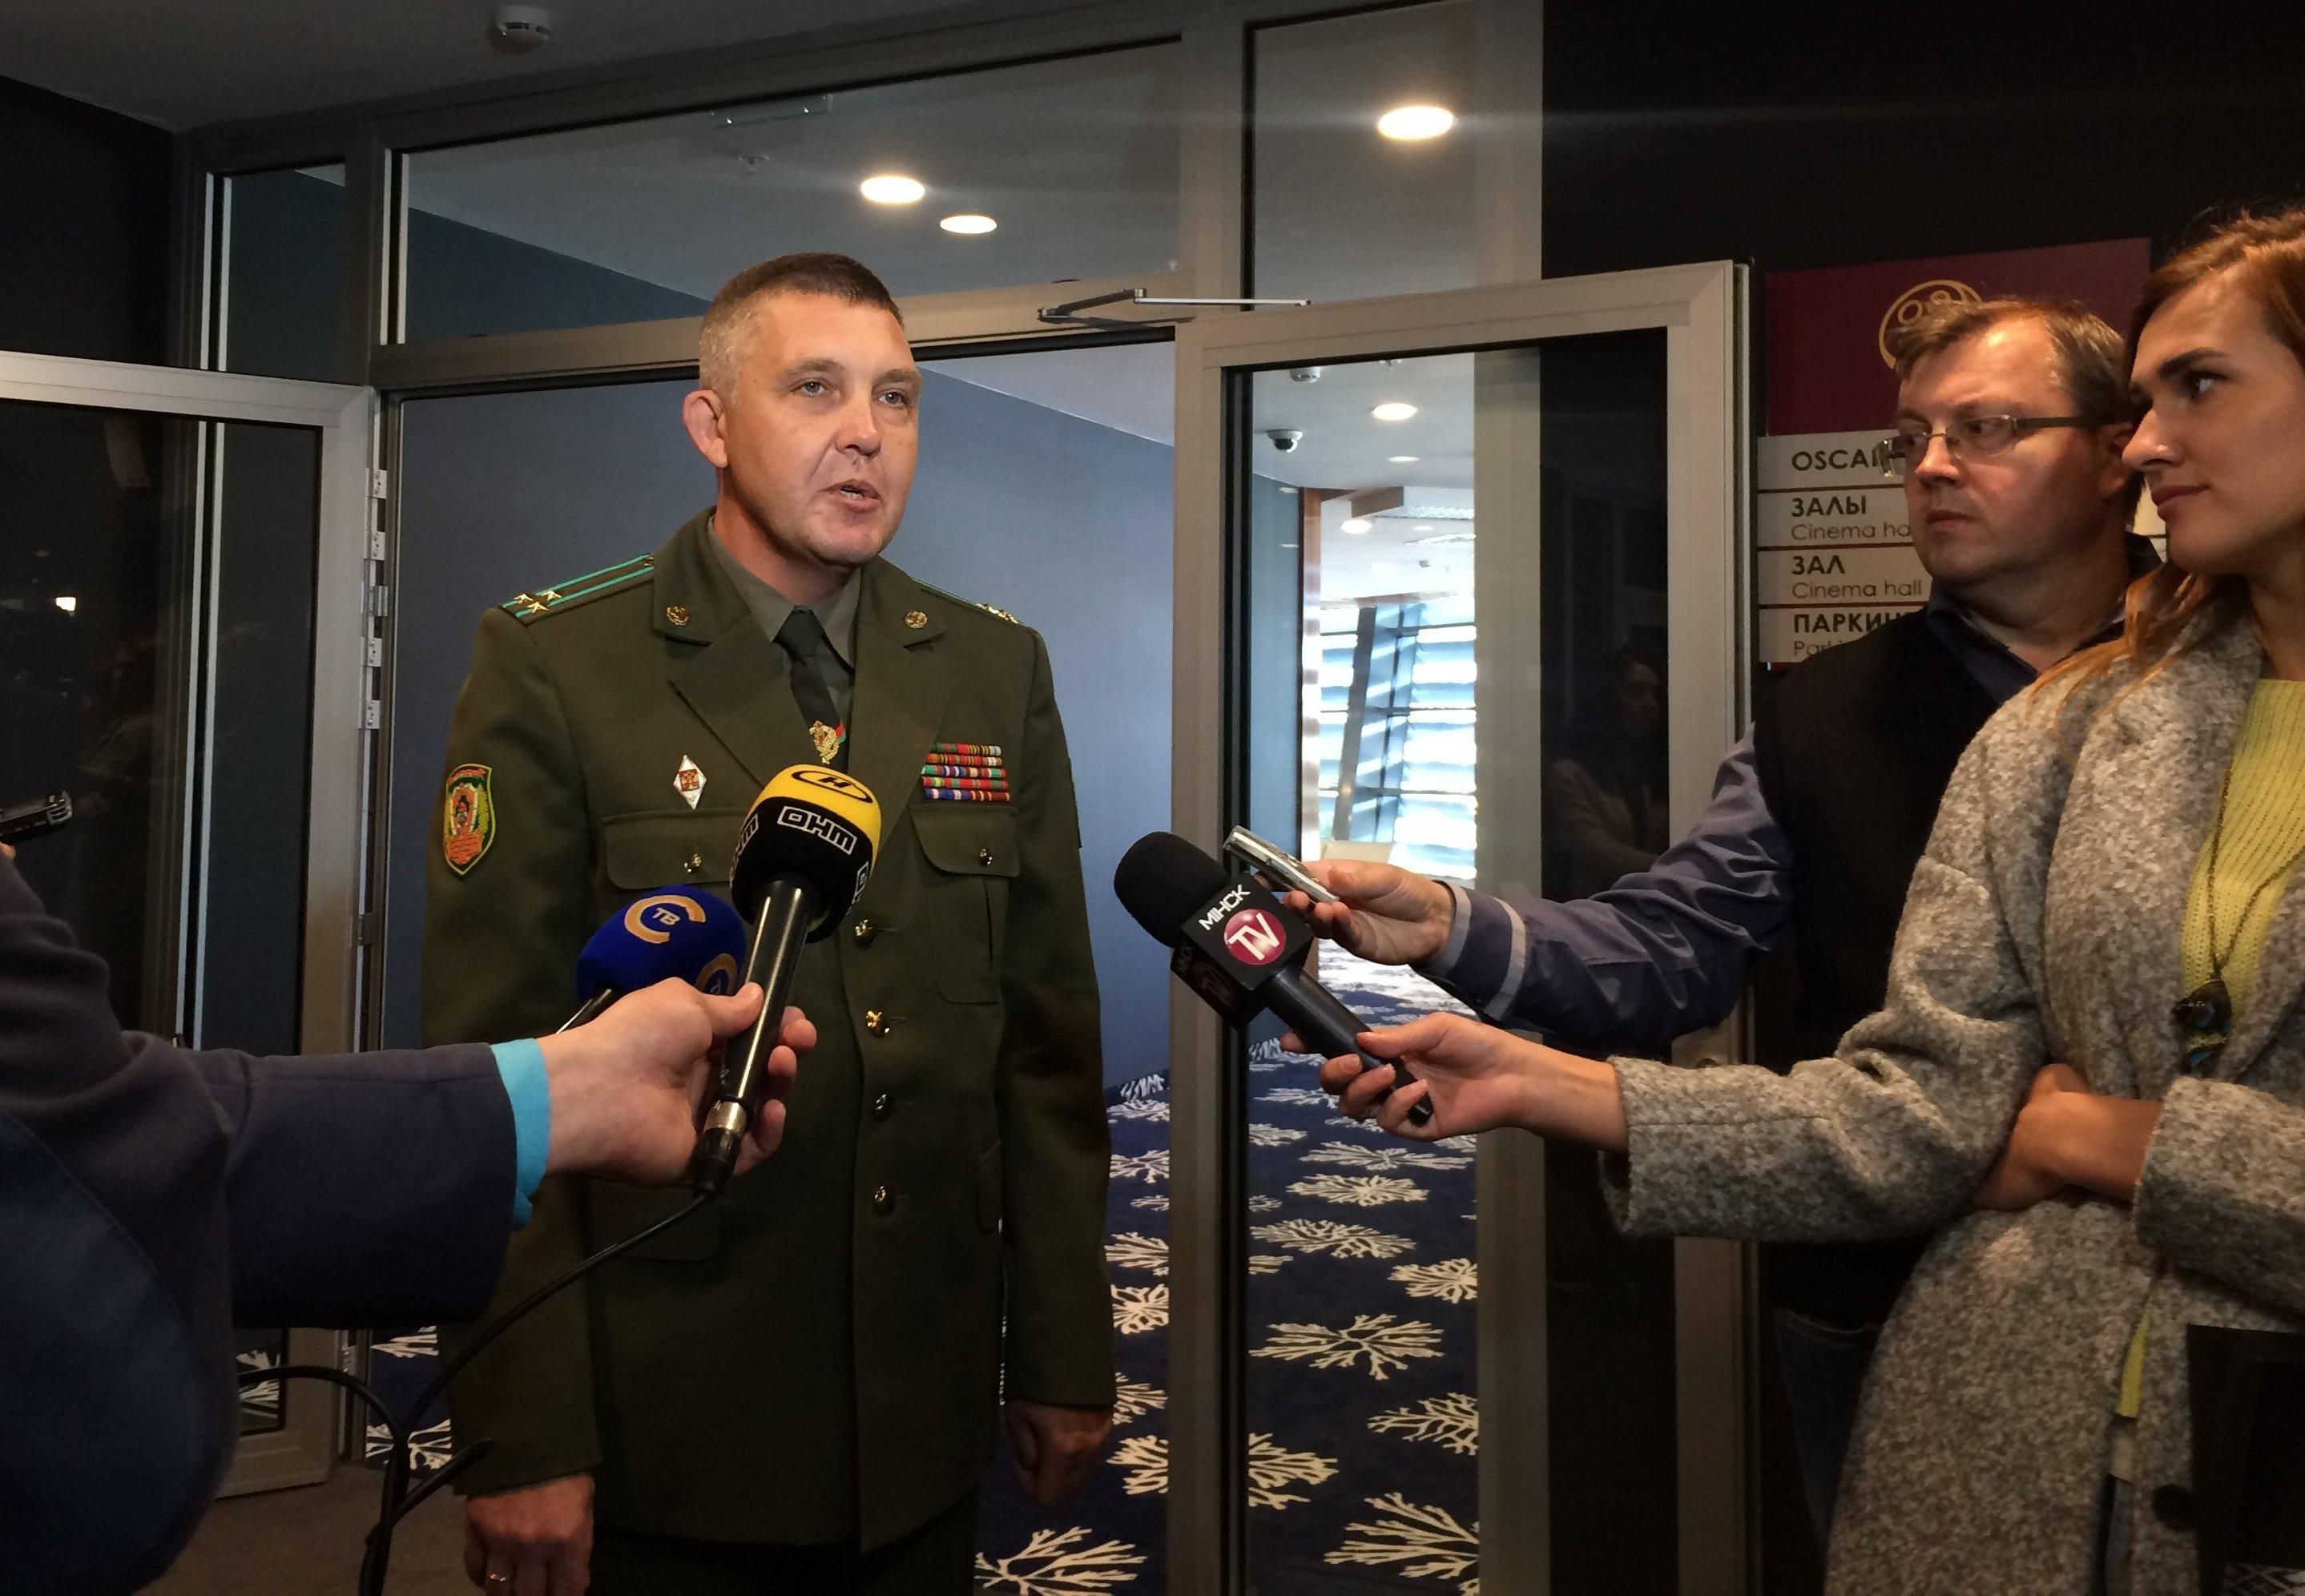 Гостям H.O. G. Rally вМинске сделали безвизовый заезд вБеларусь